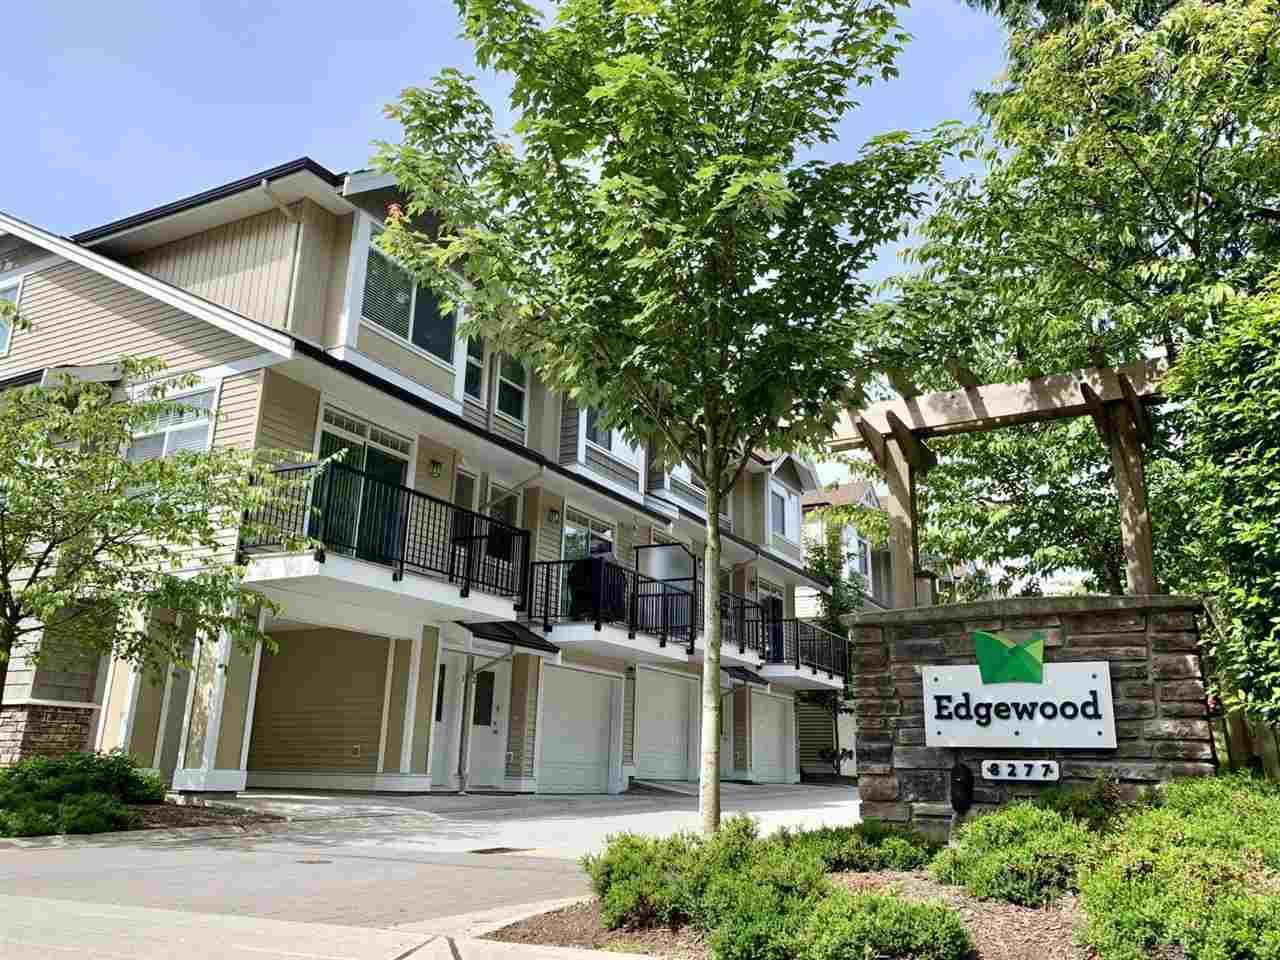 Main Photo: 6 8277 161 Street in Surrey: Fleetwood Tynehead Townhouse for sale : MLS®# R2377904